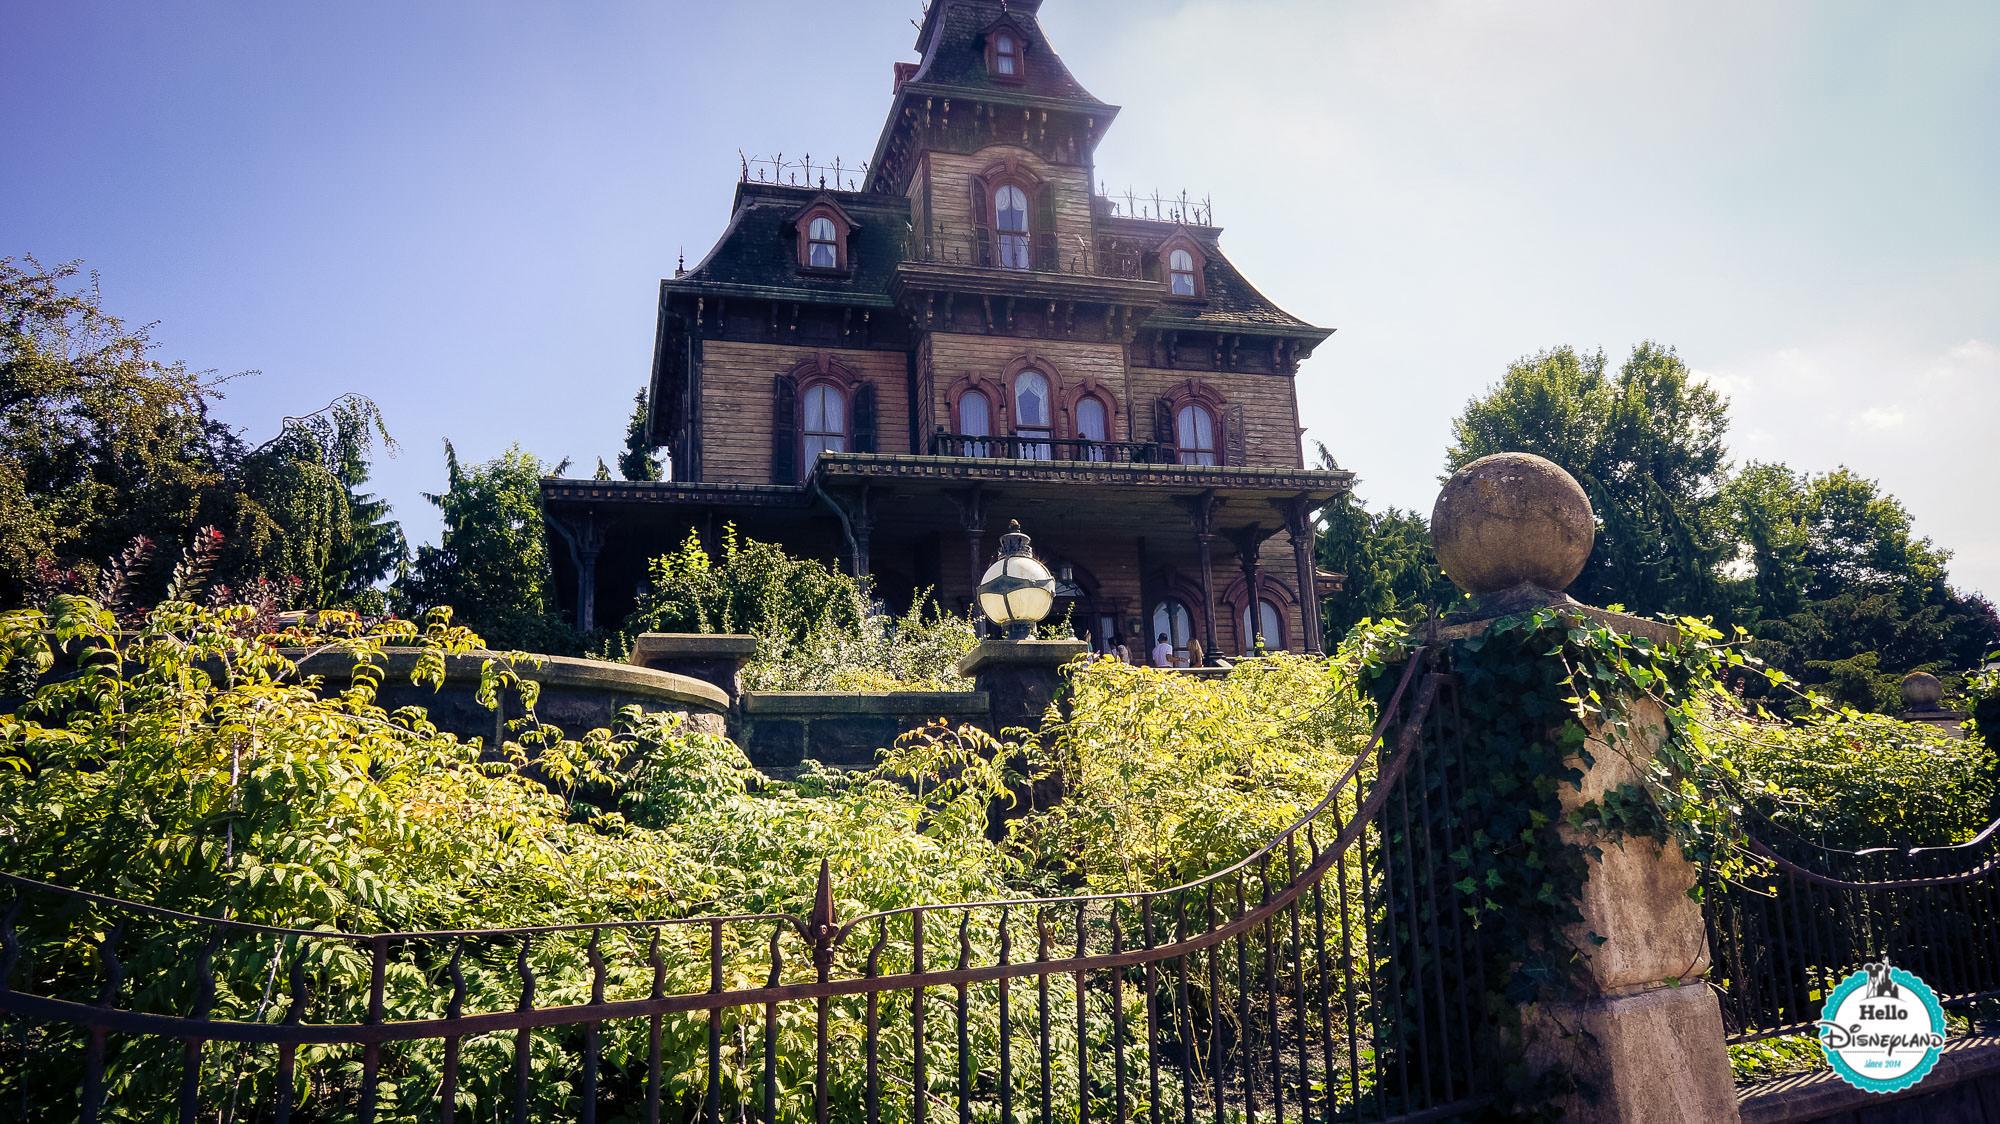 Hello disneyland le blog n 1 sur disneyland paris - La maison hantee paris ...